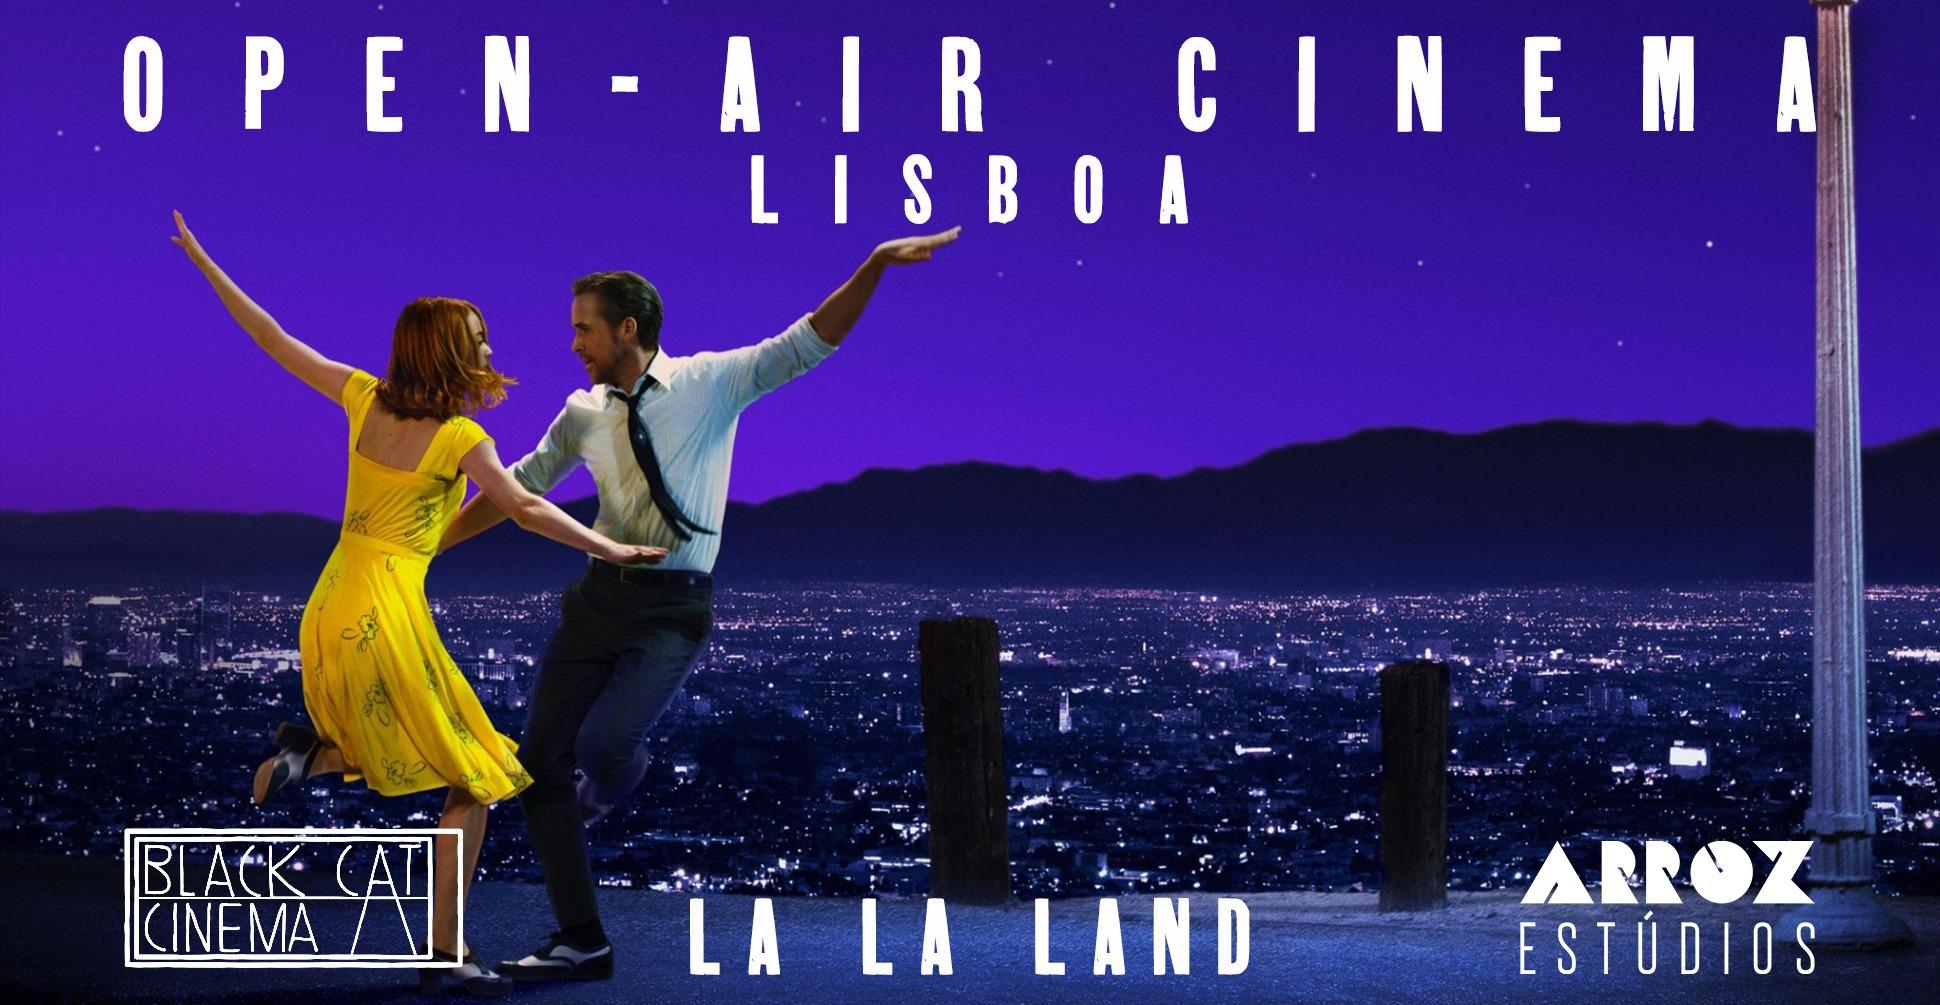 Open-air cinema: La La Land